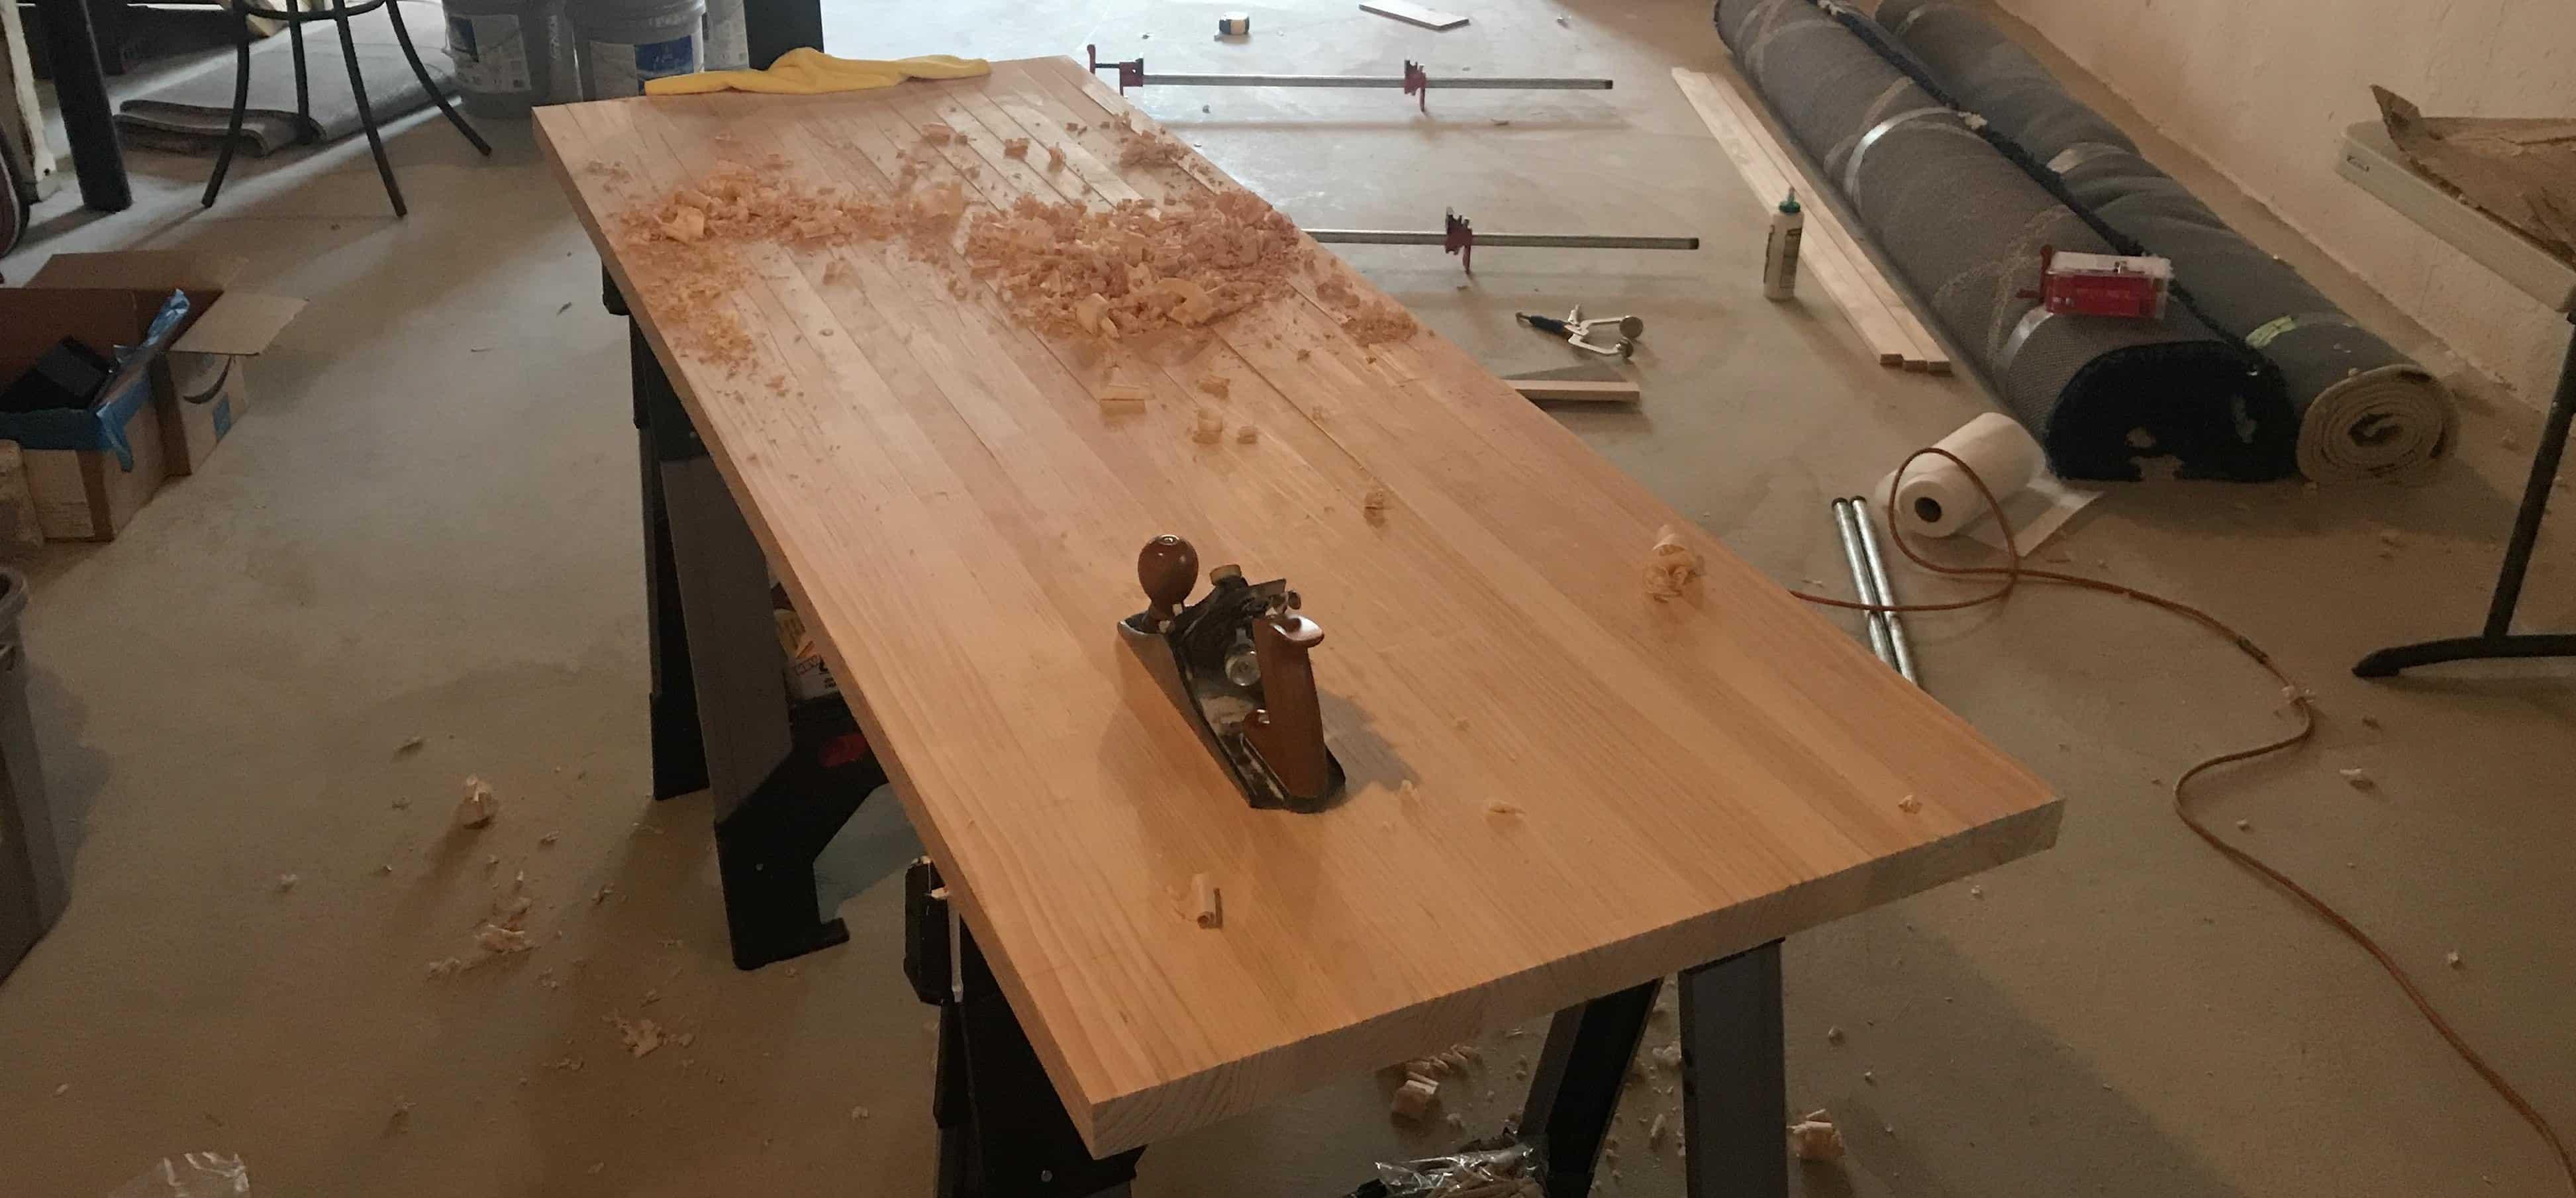 Planing wood desktop for standing desk.